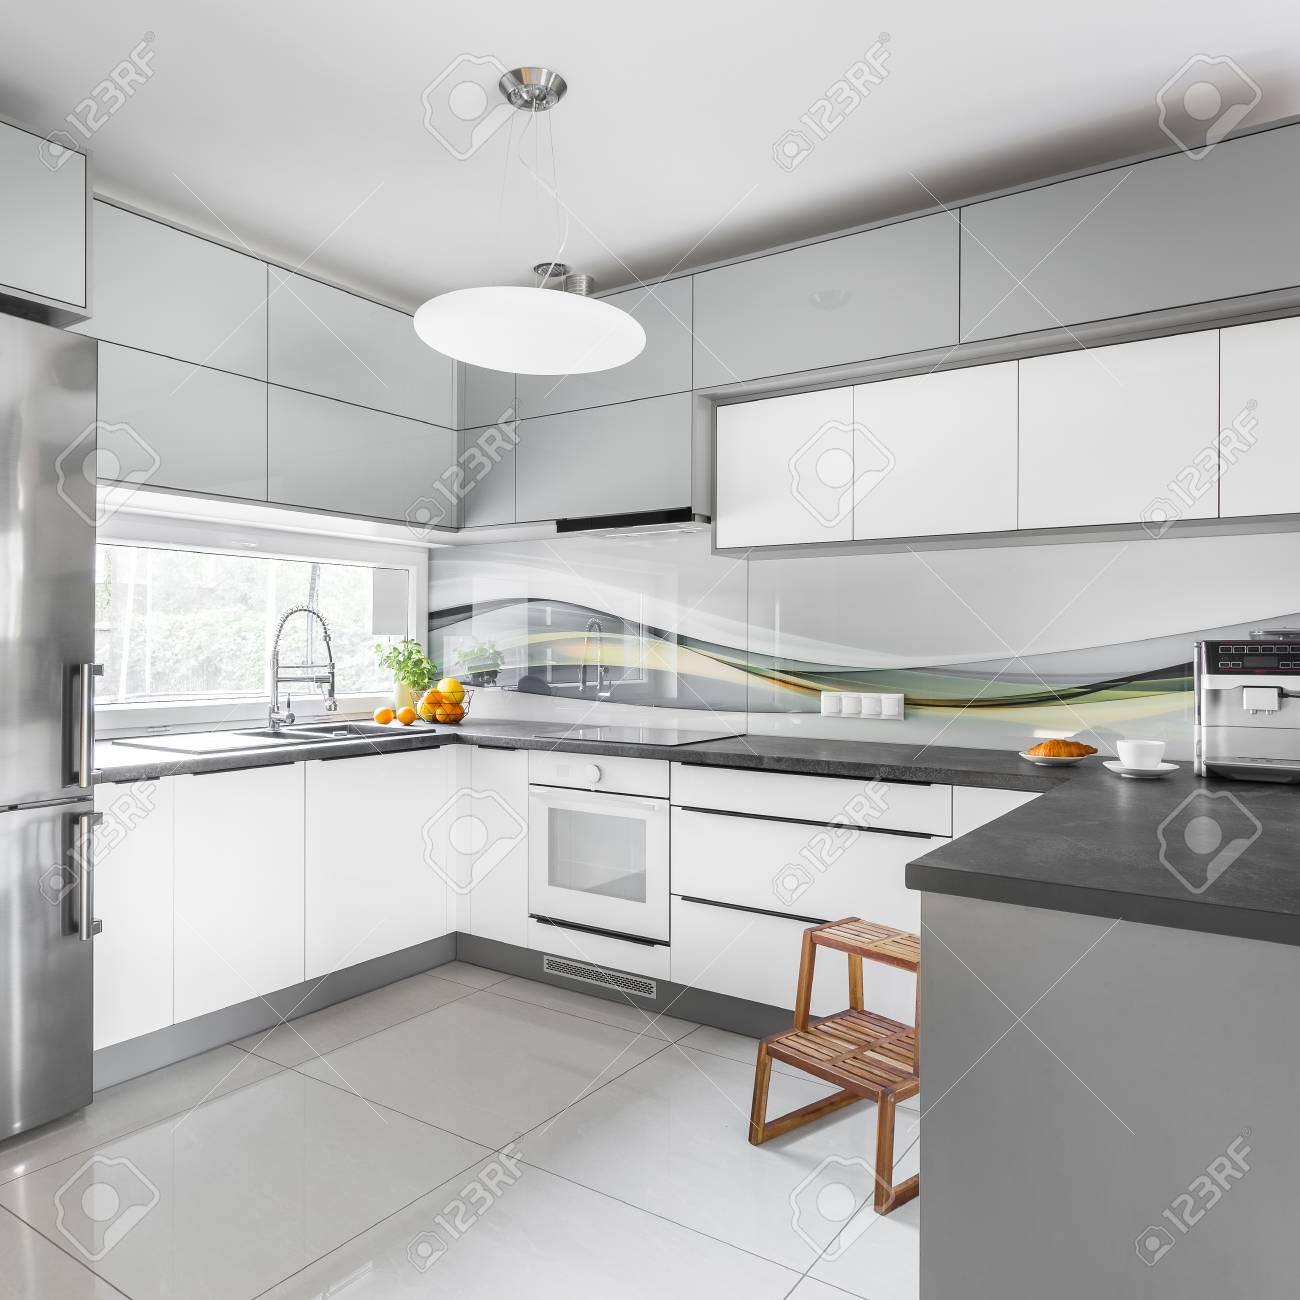 Superb Modern Design Kitchen In Grey And White With Wooden Step Stool Machost Co Dining Chair Design Ideas Machostcouk